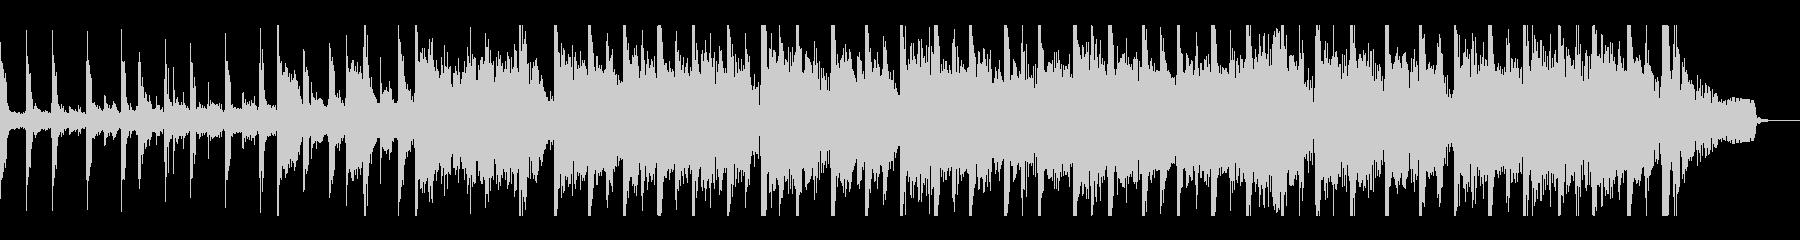 EDM、ポッドキャスト、オープナーの未再生の波形